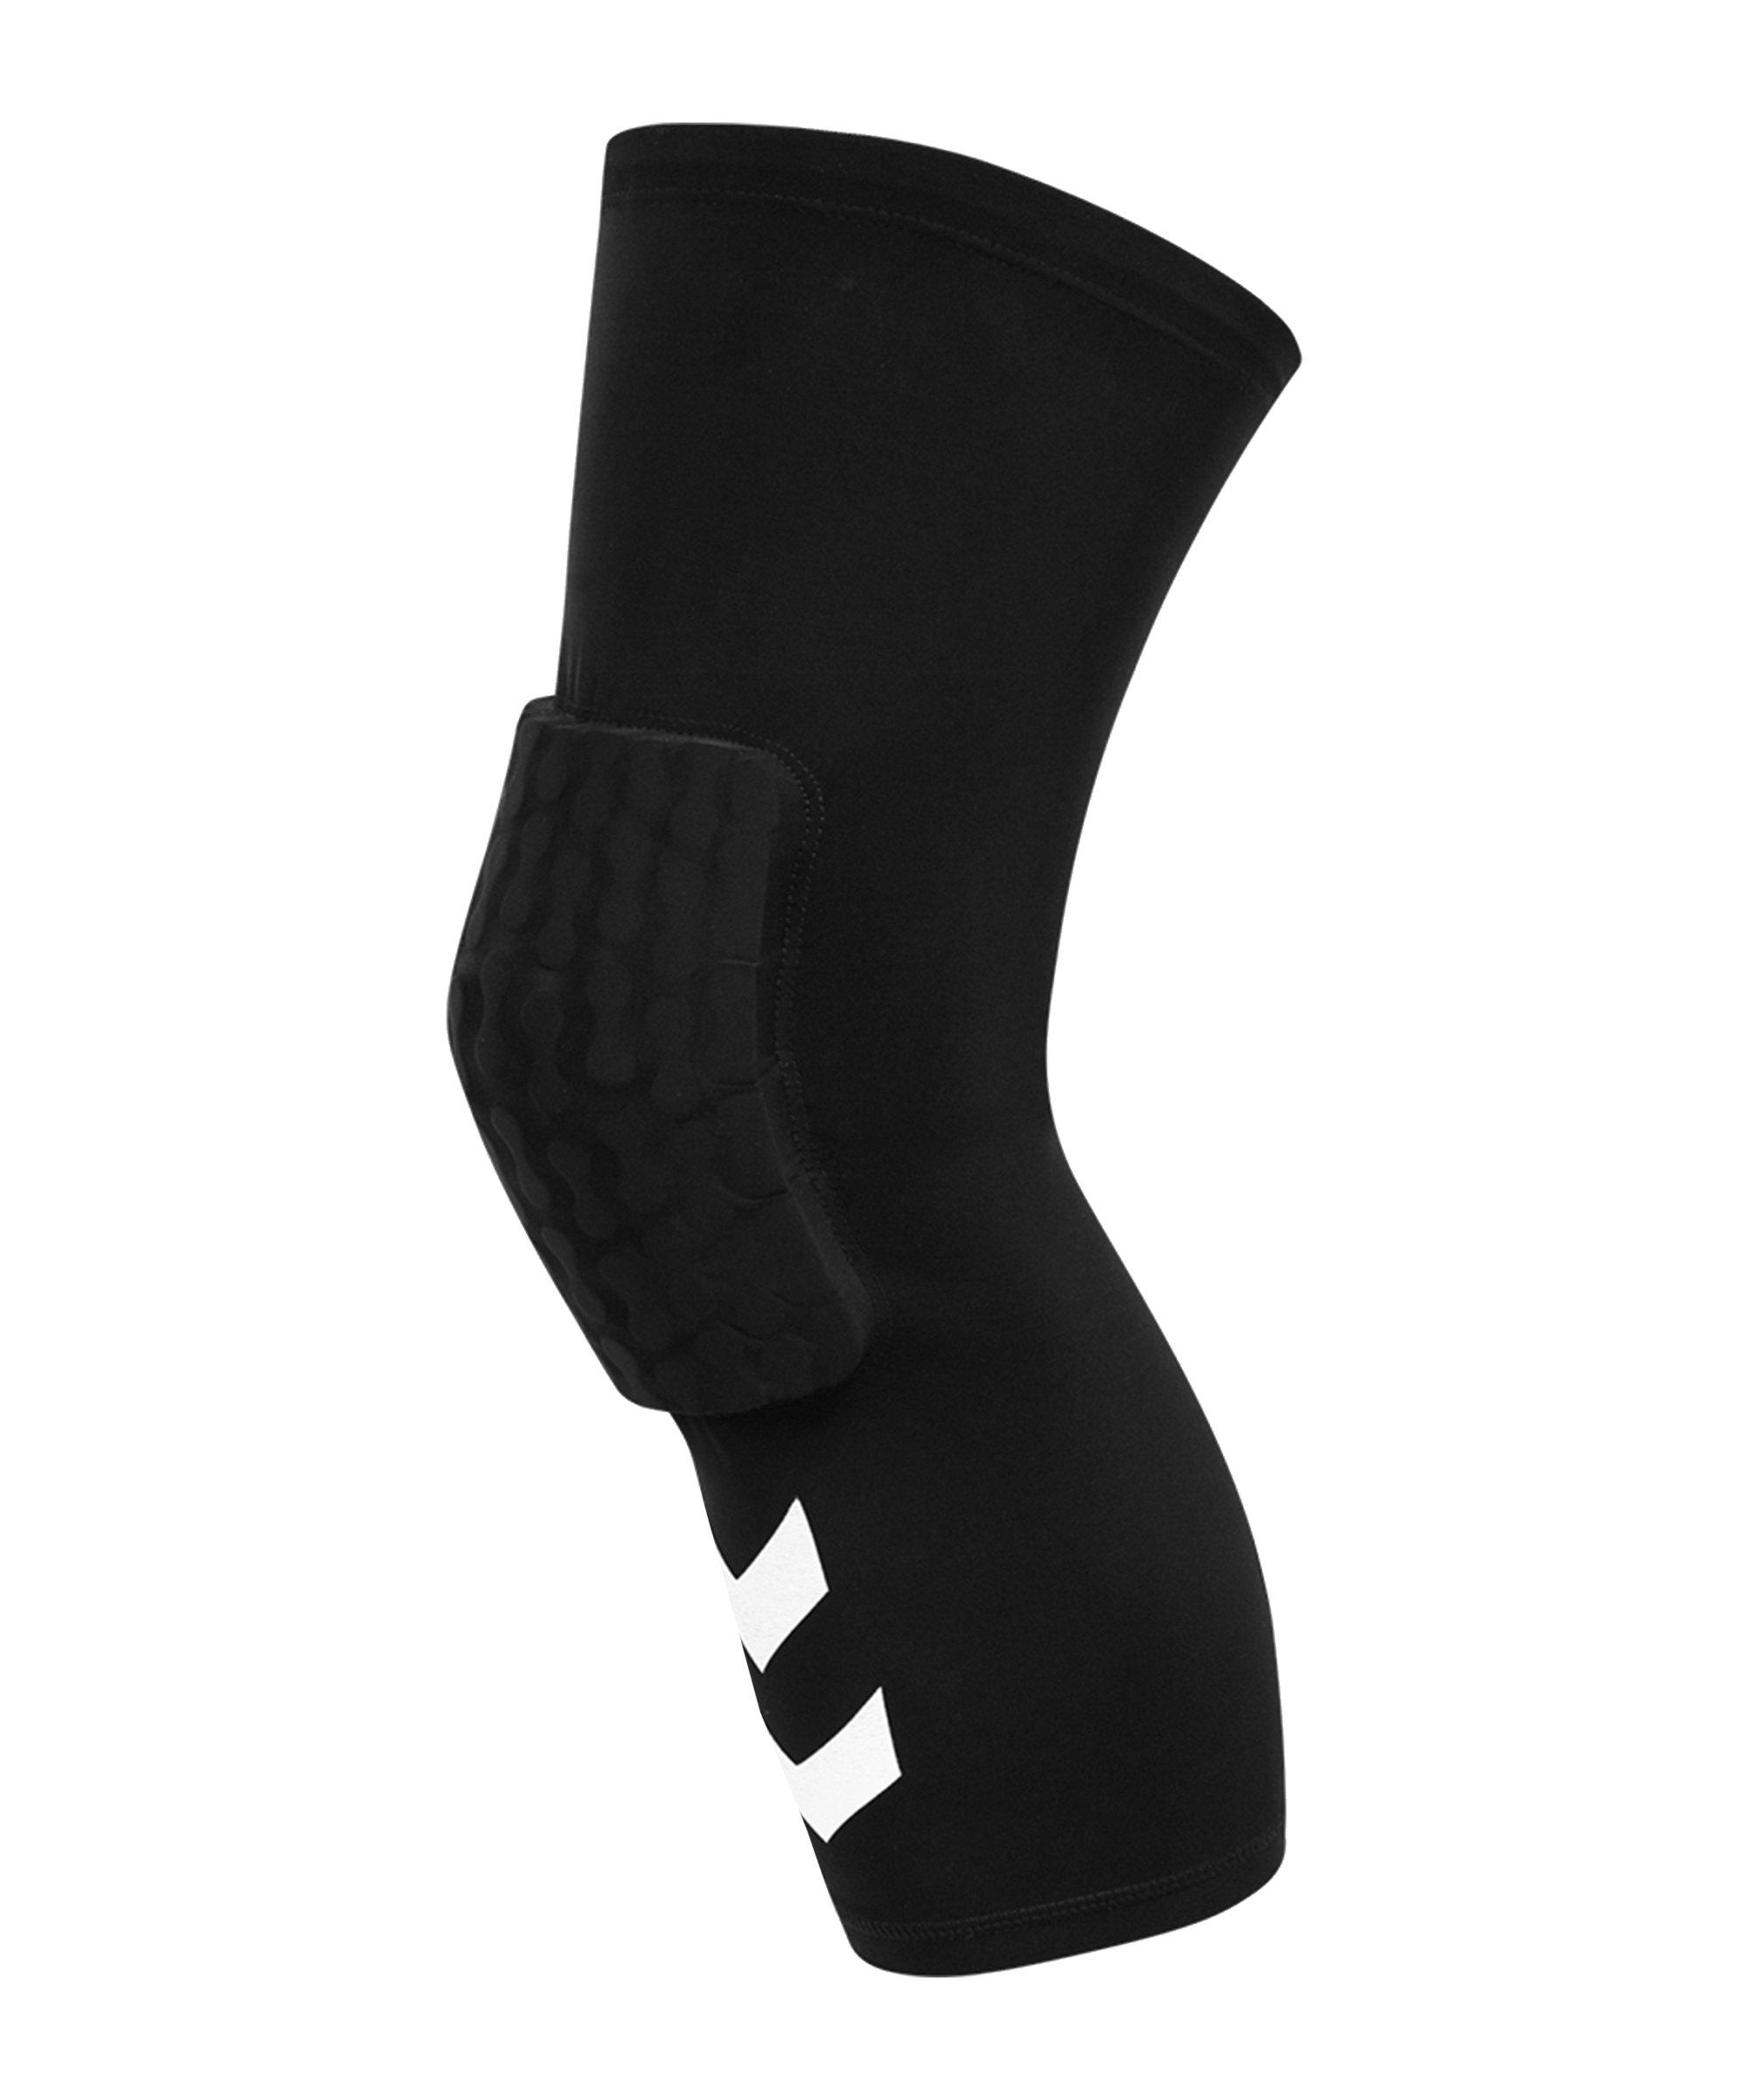 Hummel Protection Knee Long Sleeve Schwarz F2001 - schwarz